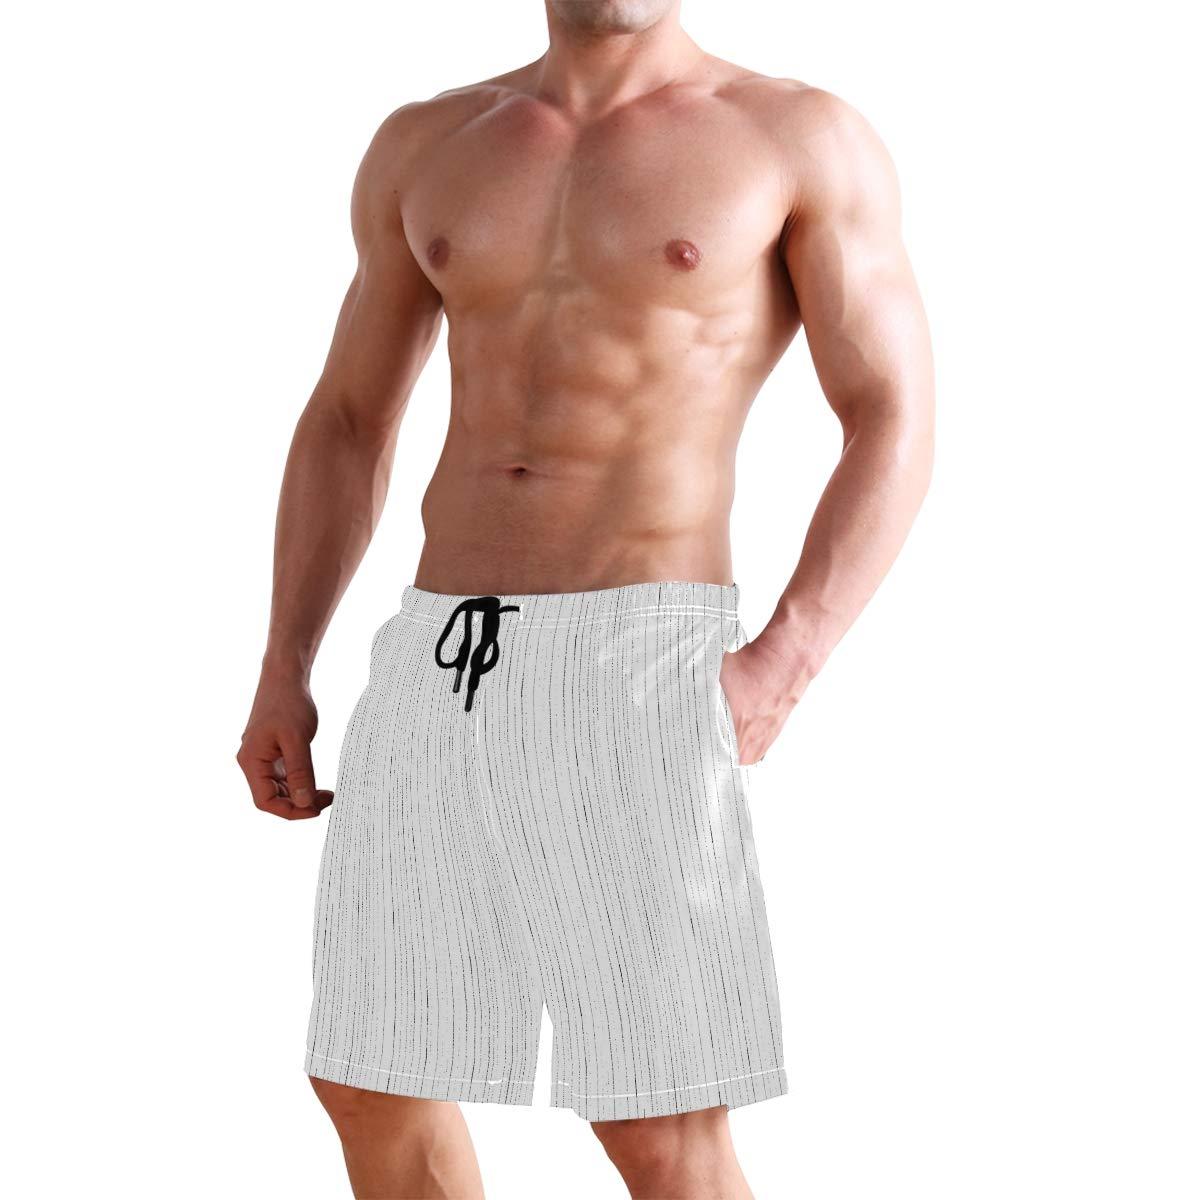 Black Lines Striped Decoration Mens Fashion Casual Classic Beach Shorts Quick-Dry Gym Adjustable Drawstring Shorts Yoga